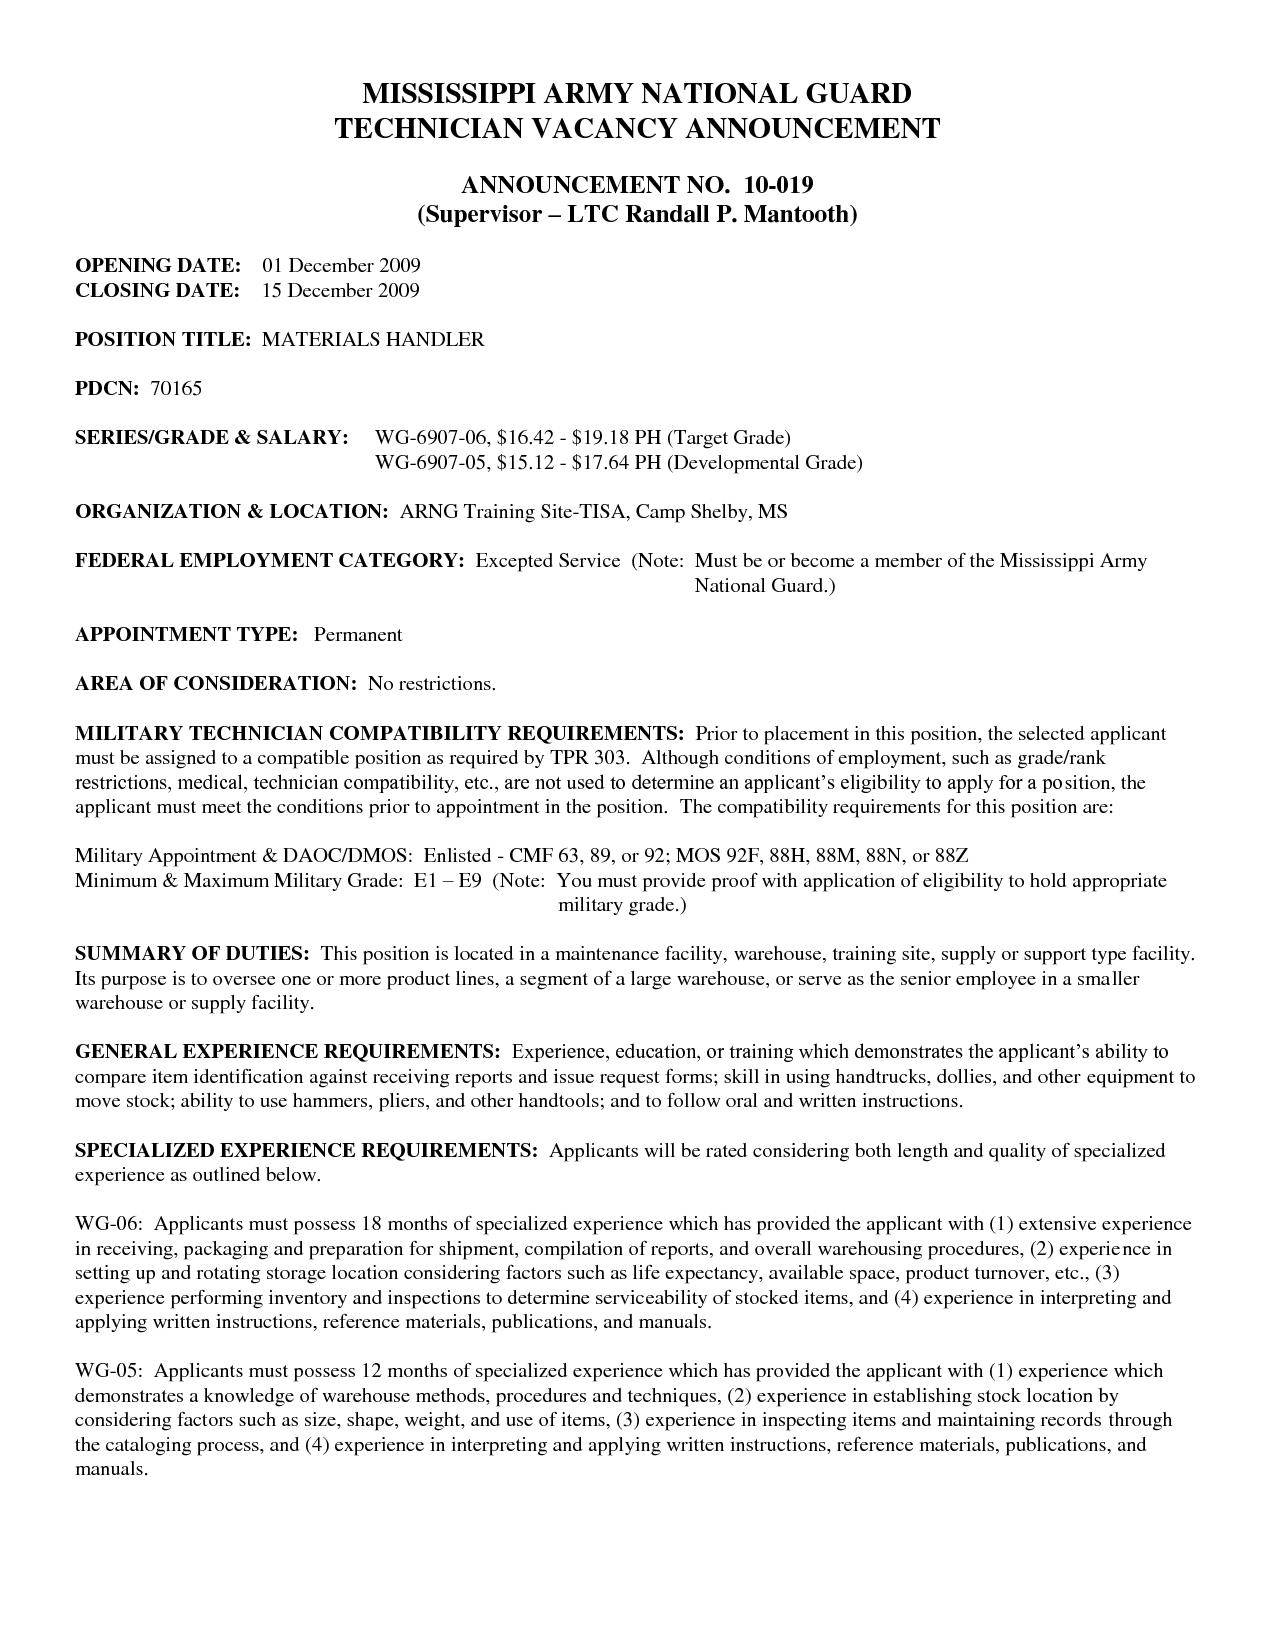 92f Resume Examples Resume Templates Resume Examples Job Resume Examples Professional Resume Examples